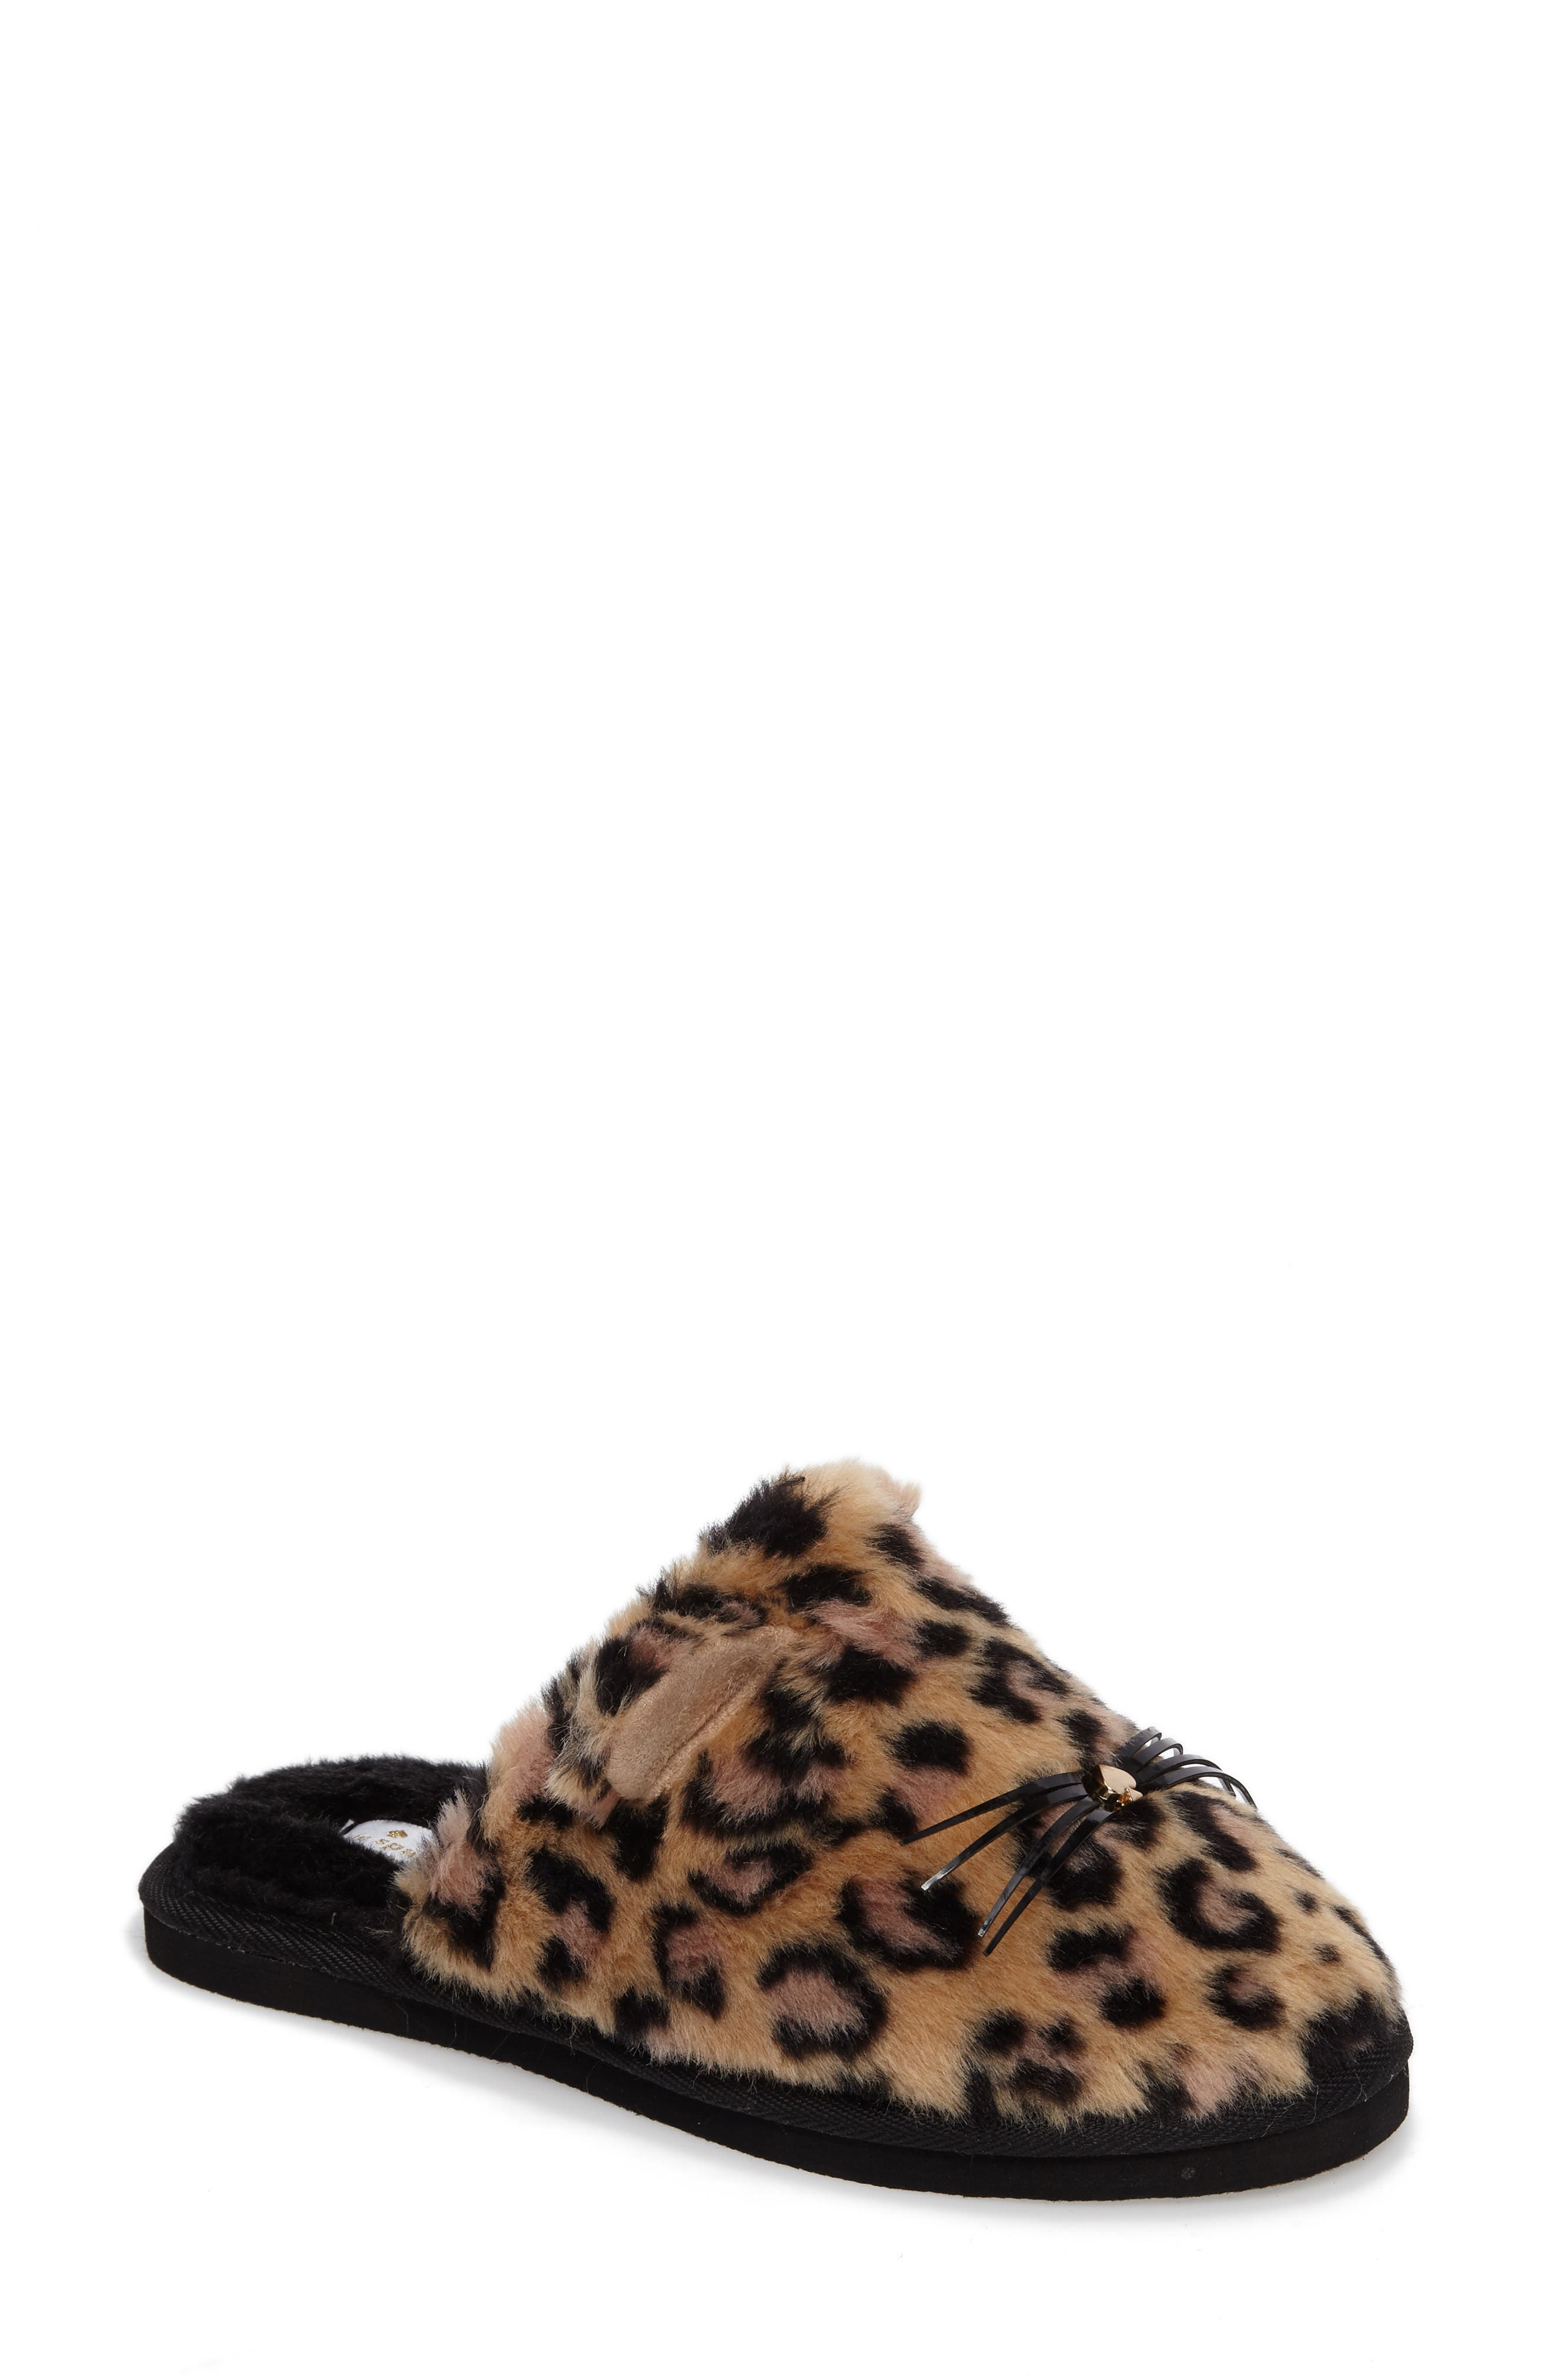 Alternate Image 1 Selected - kate spade new york belindy scuff slipper (Women)